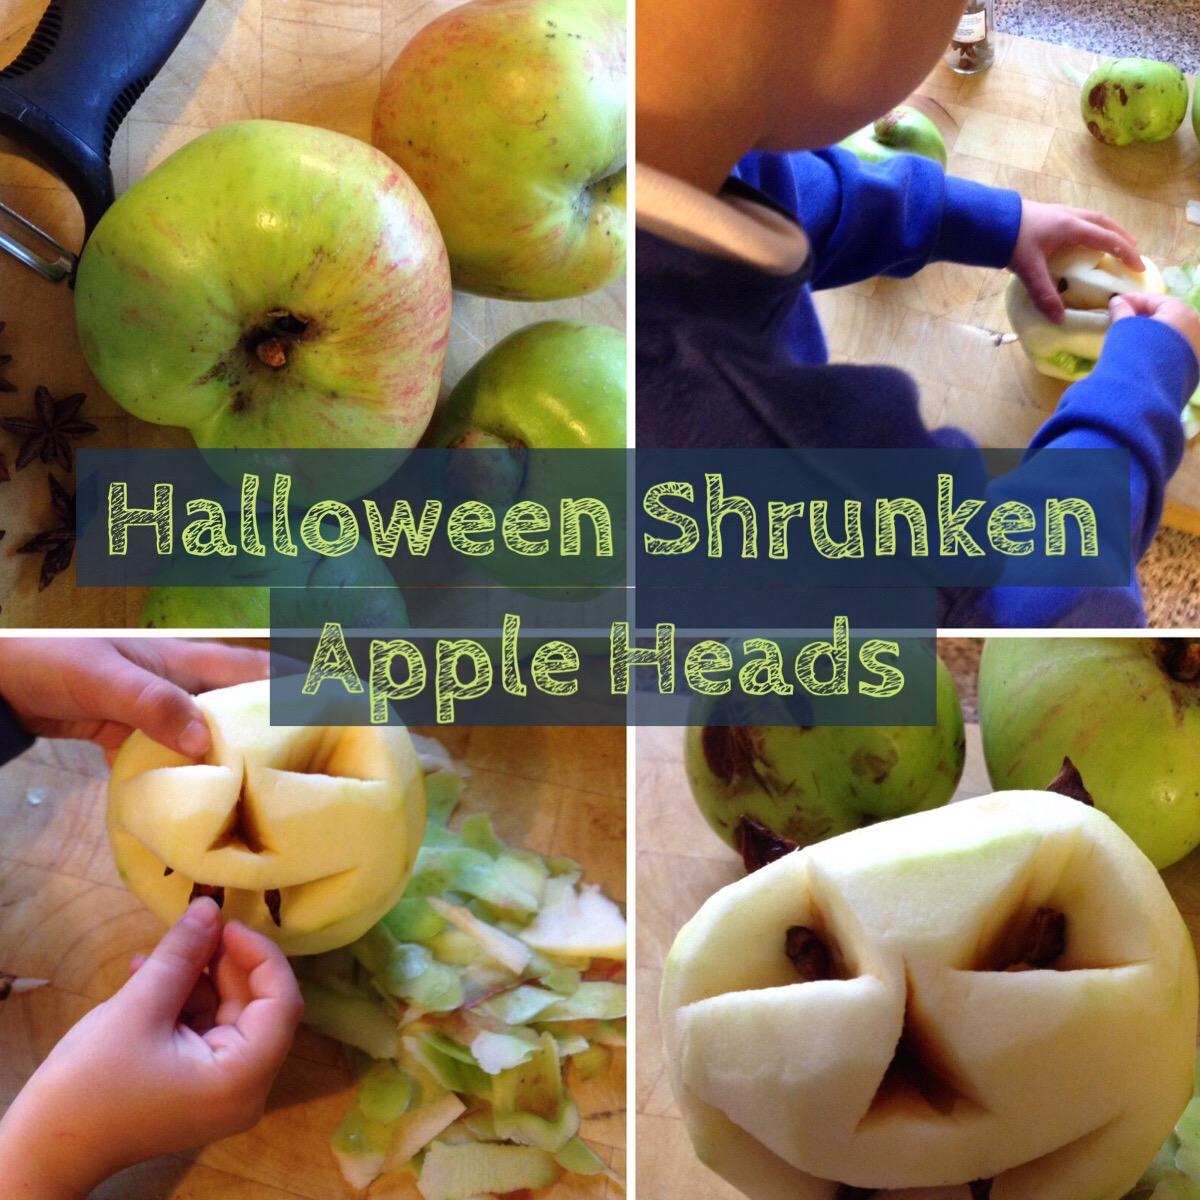 how to make shrunken apple heads for halloween by Lottie Makes